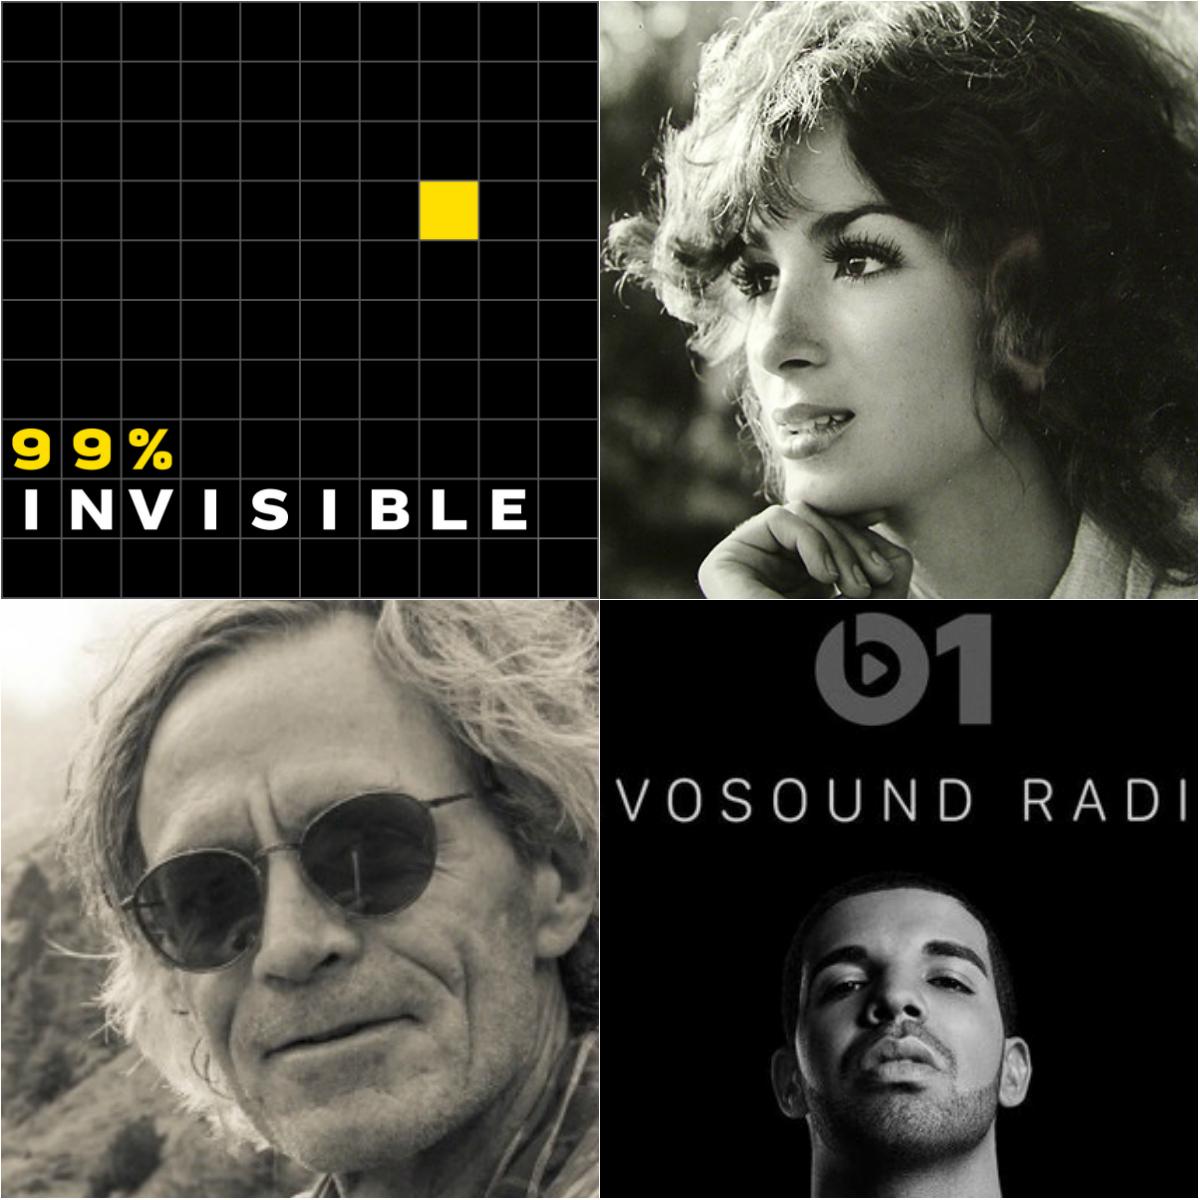 DAGLIGE ANBEFALINGER:     99% Invisible, Everything Is Stories, Scott Carrier og OVO SOUND RADIO er blant våre favoritter.